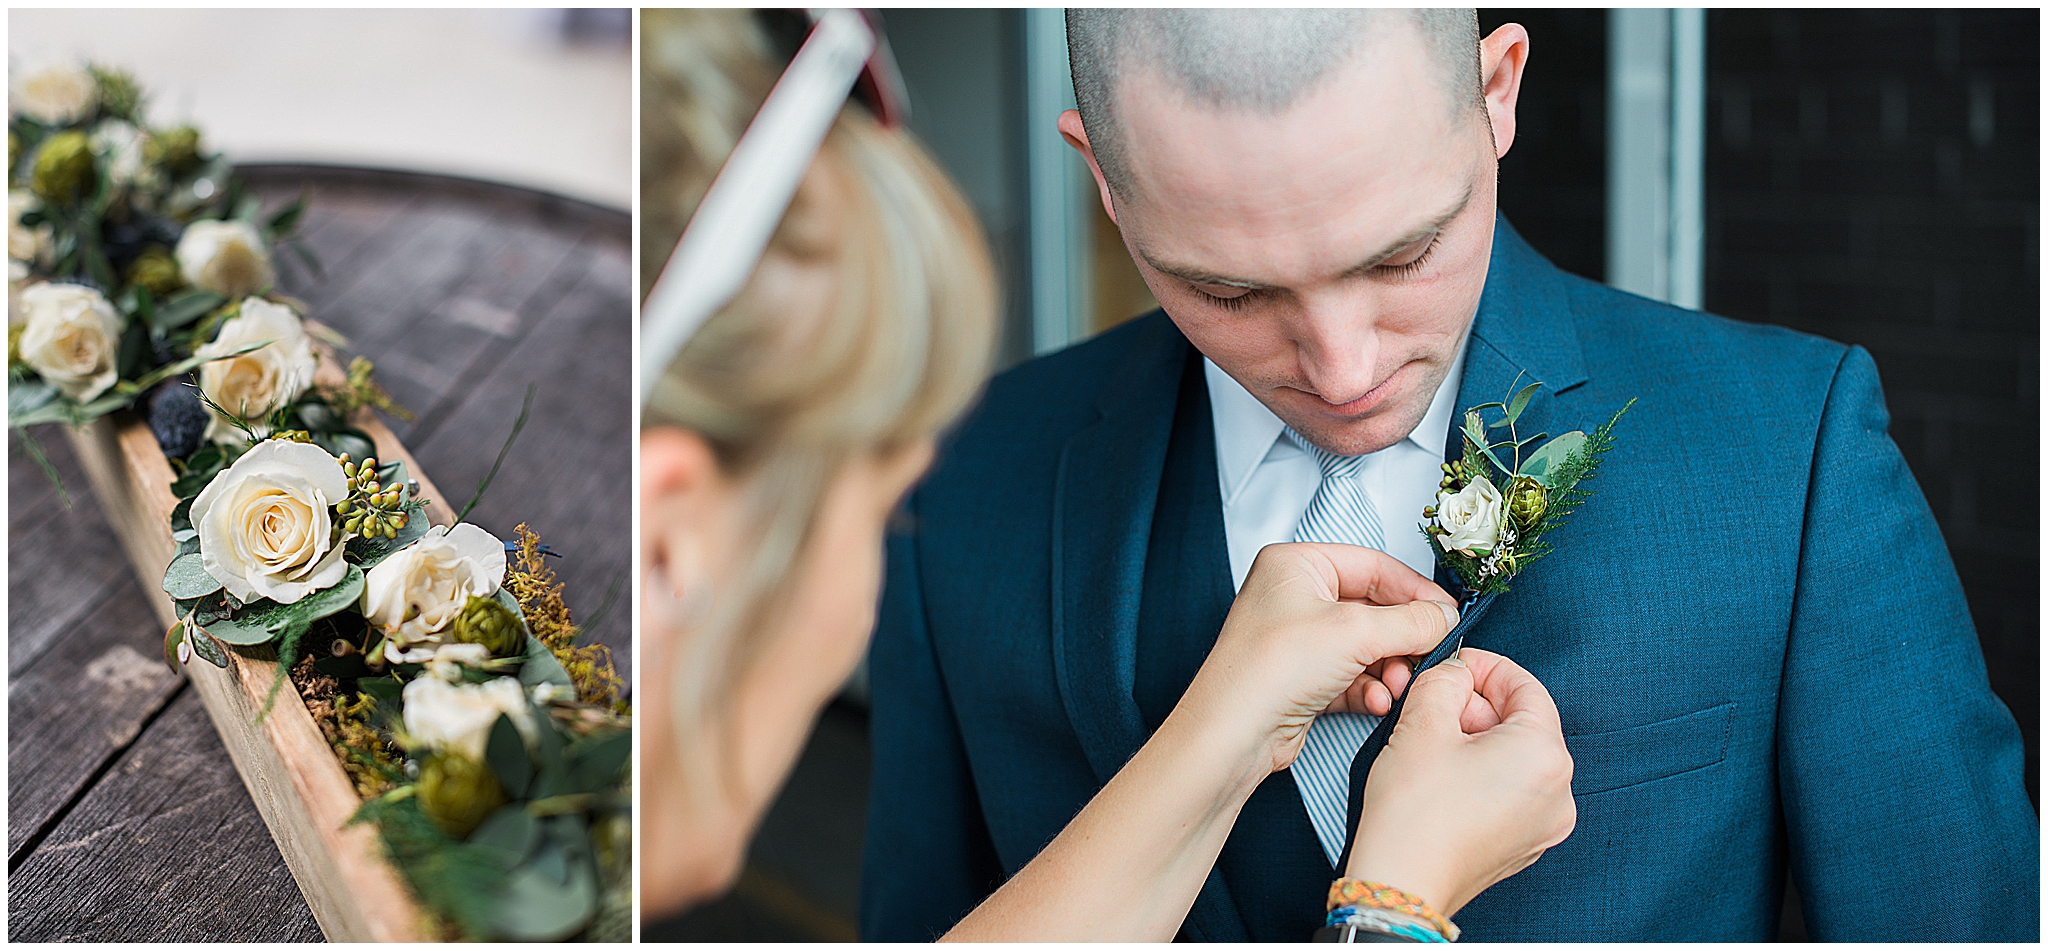 Wedding_Photographer_Asheville_Highland_Brewing_0005.jpg